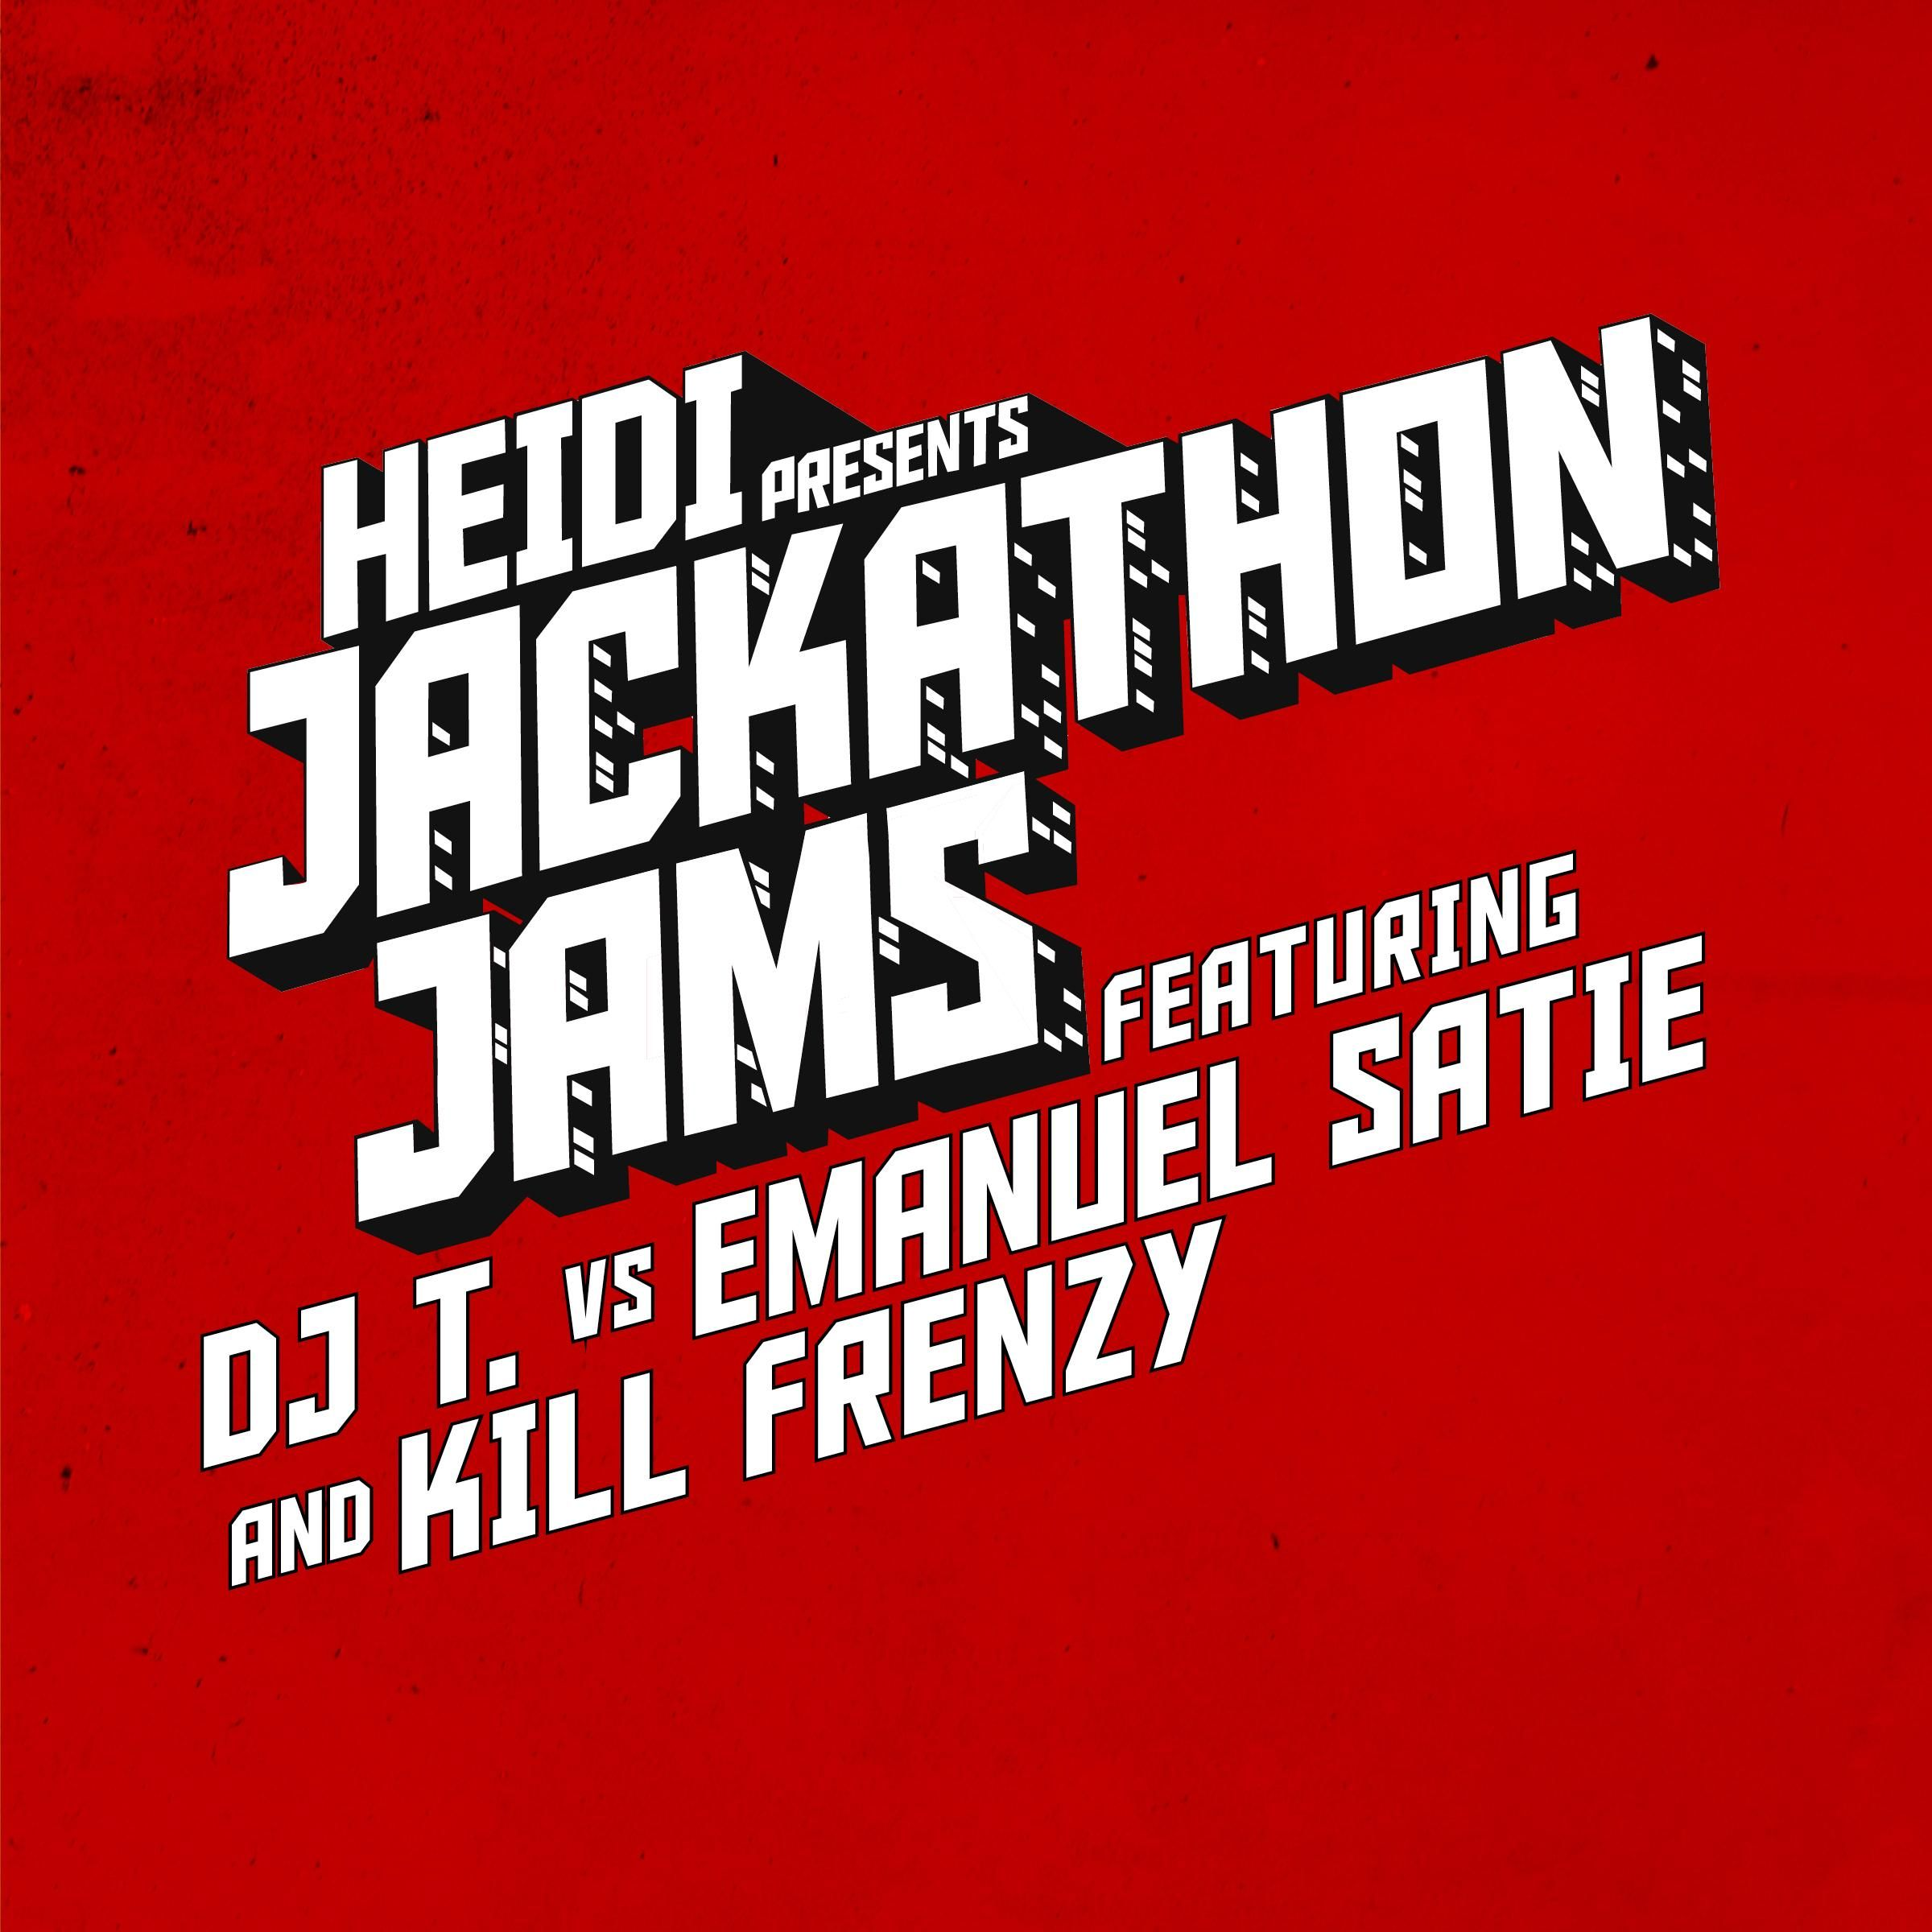 160307-jackathon_jams_final1_lo_res.jpg